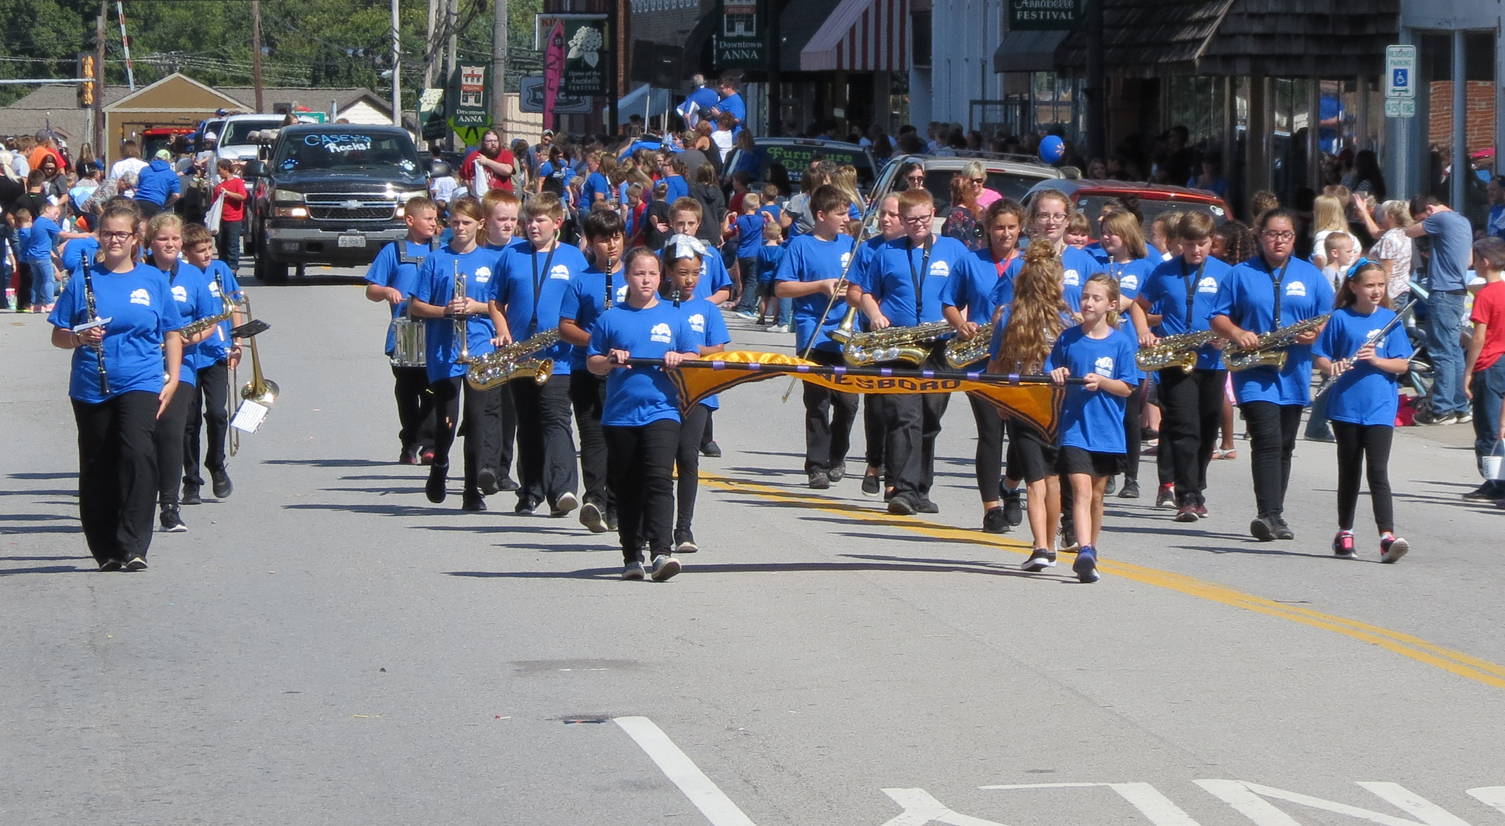 Jonesboro School marching band